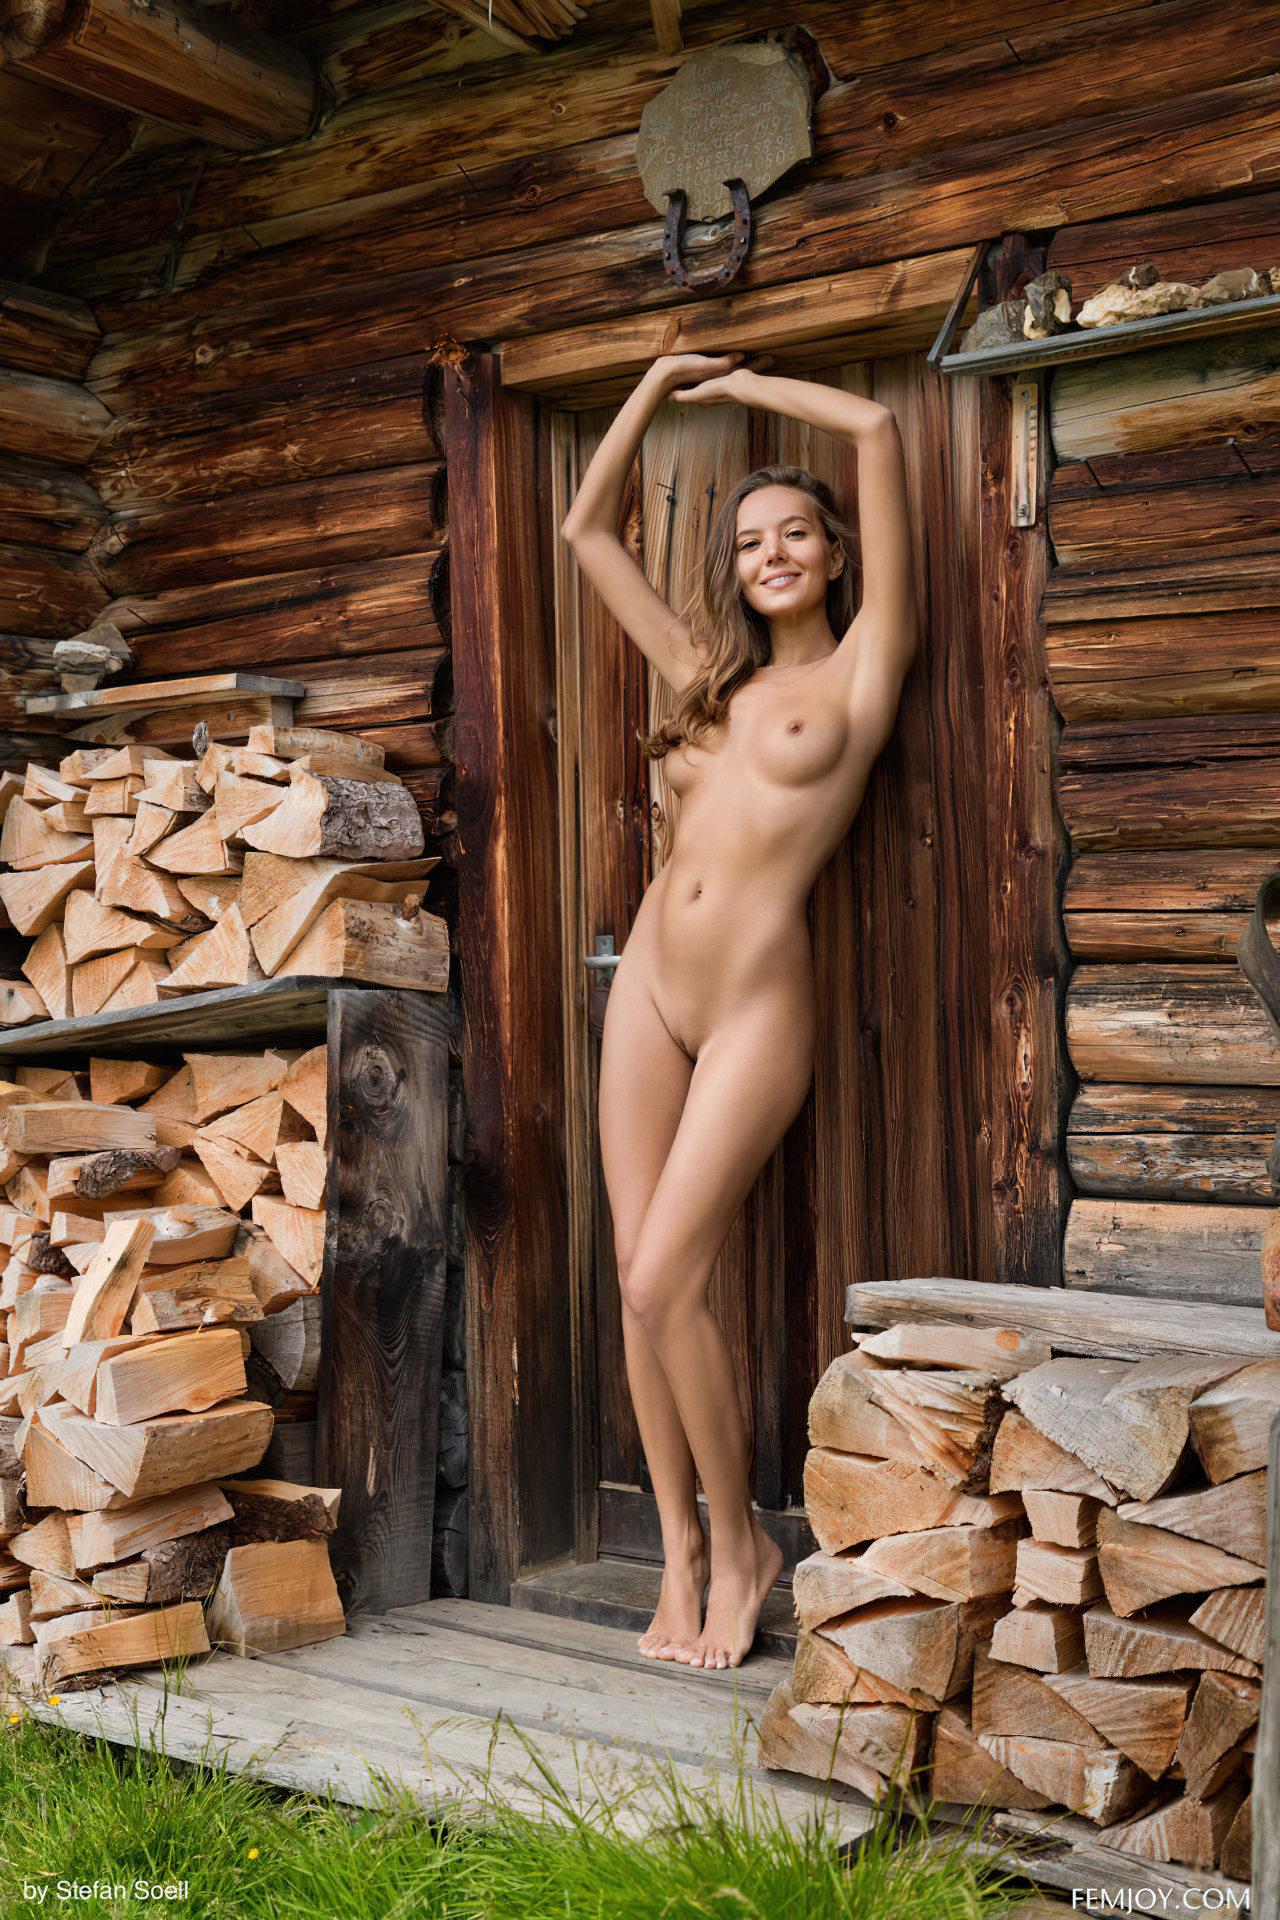 Fotos de Mulheres (3)